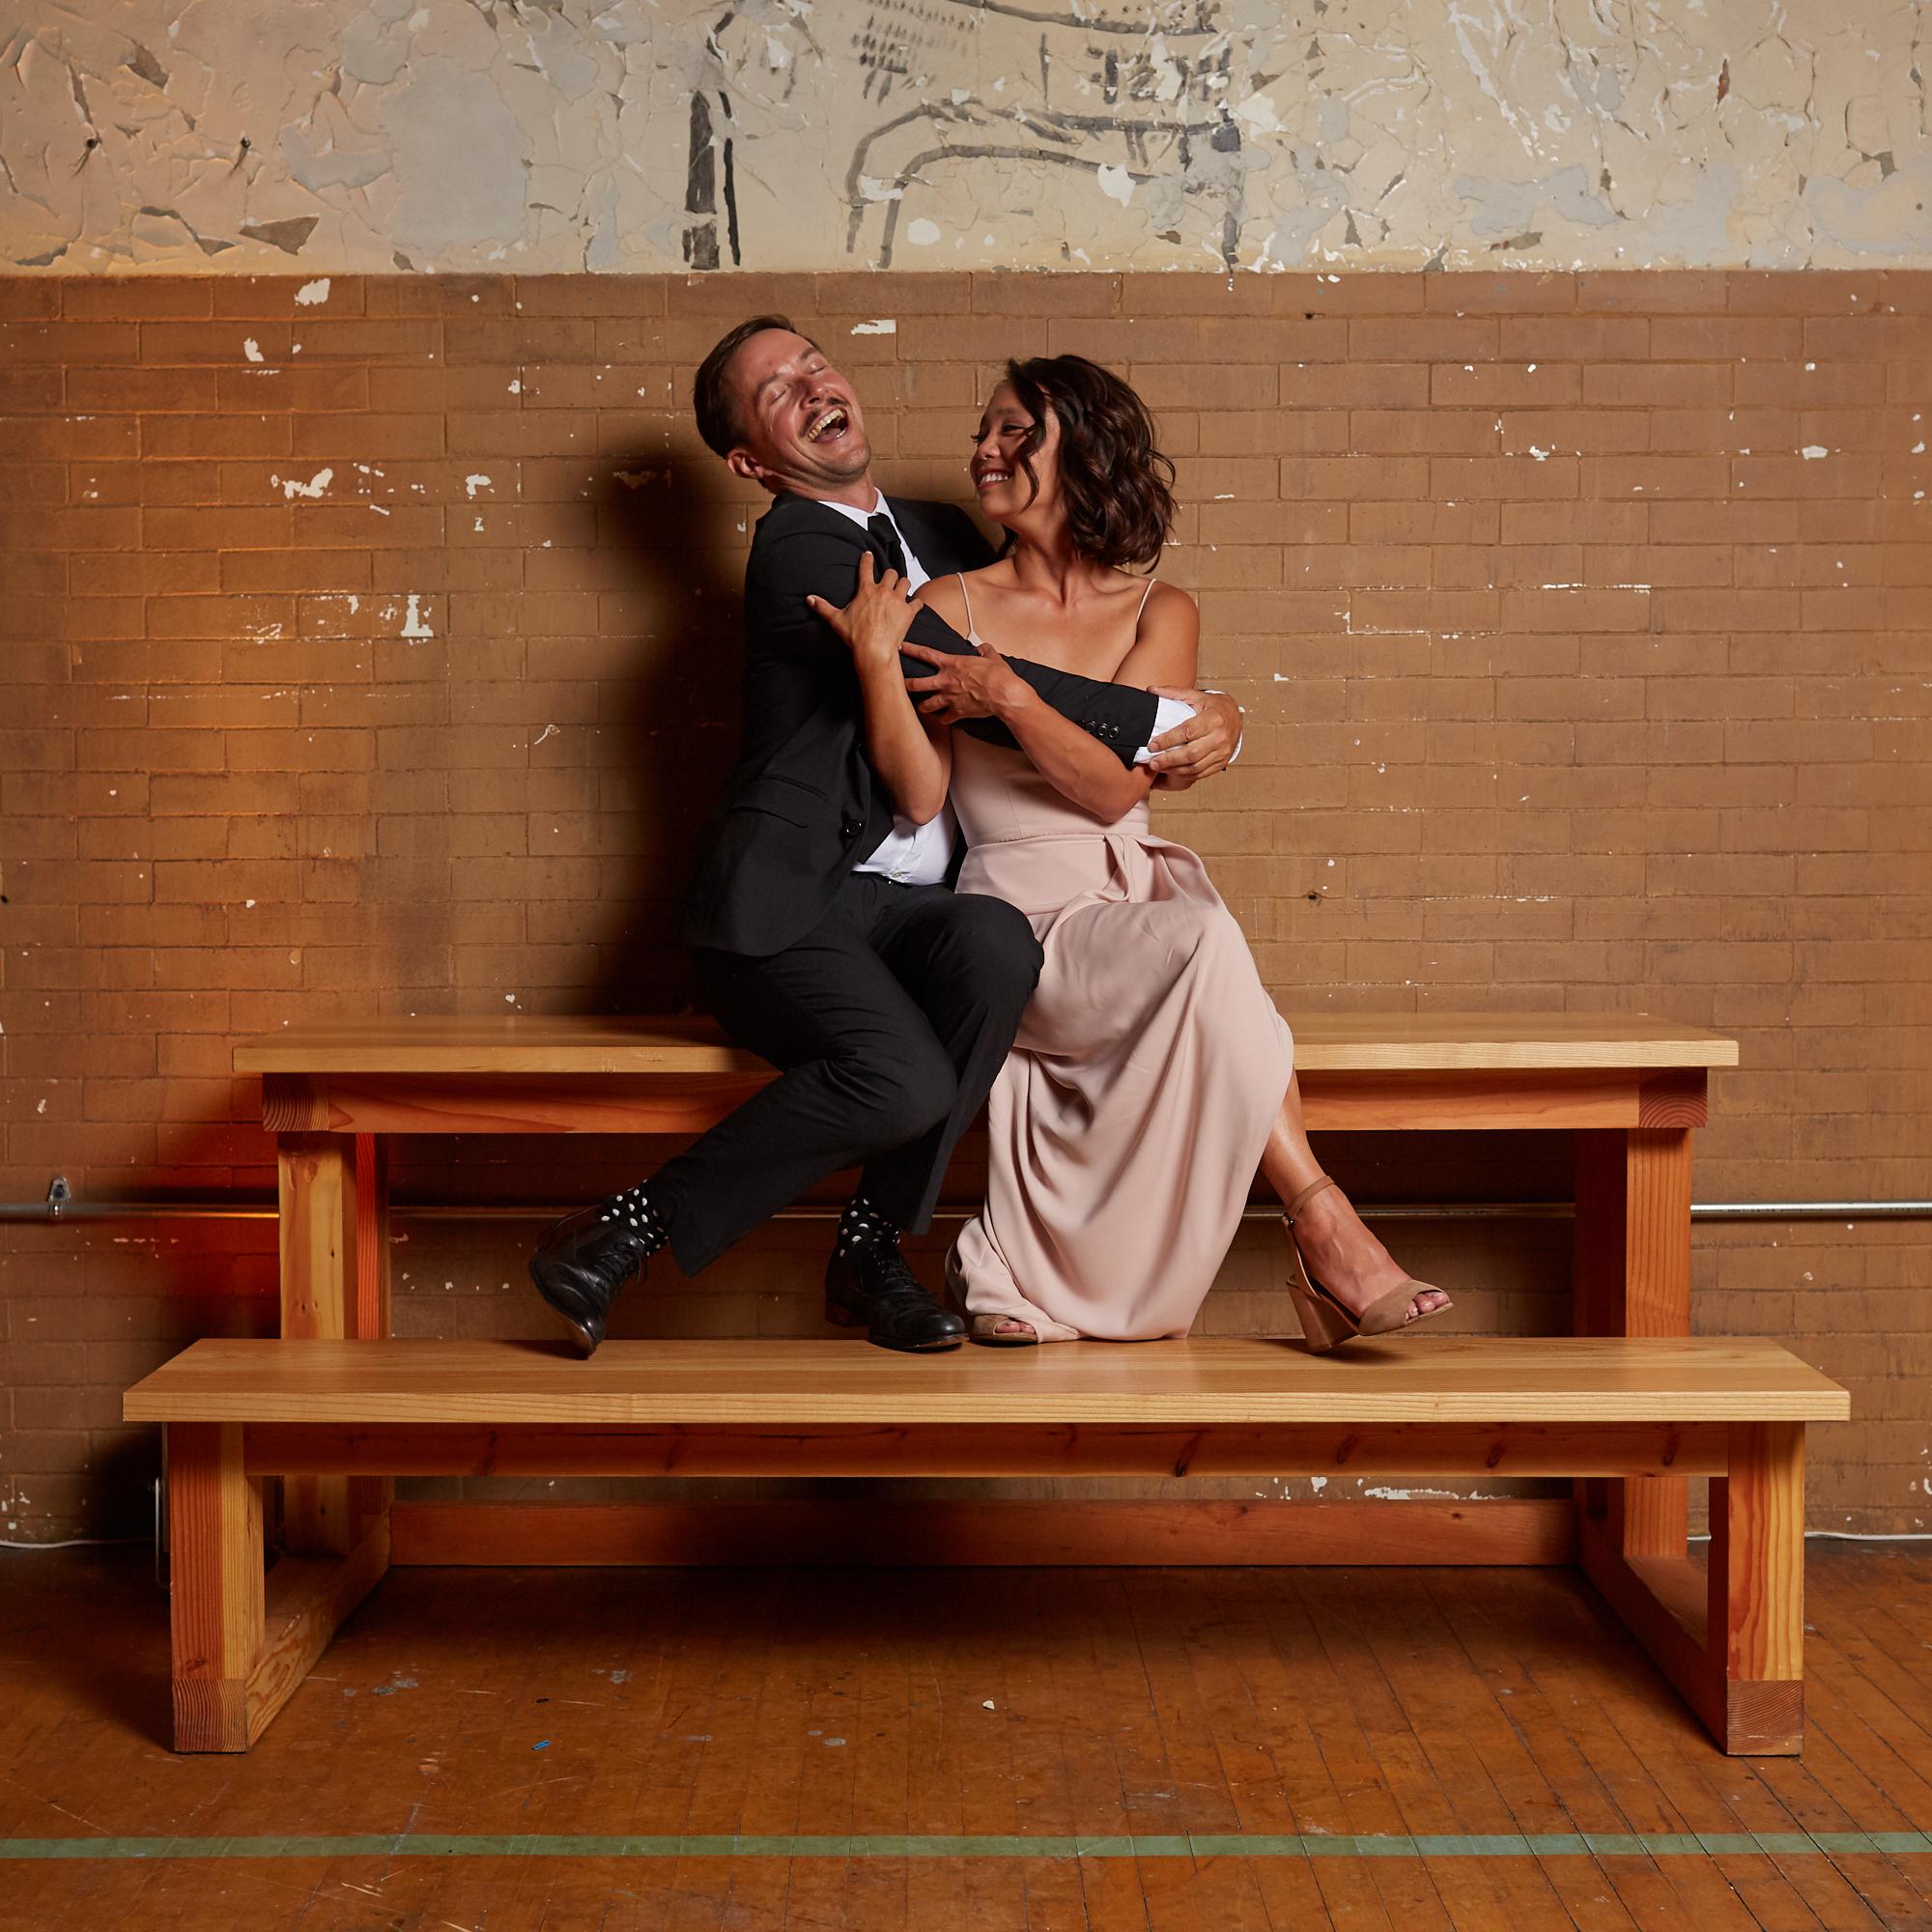 Ryan Hannah Sims - 2017.09 - Wedding Photos - 1027.jpg